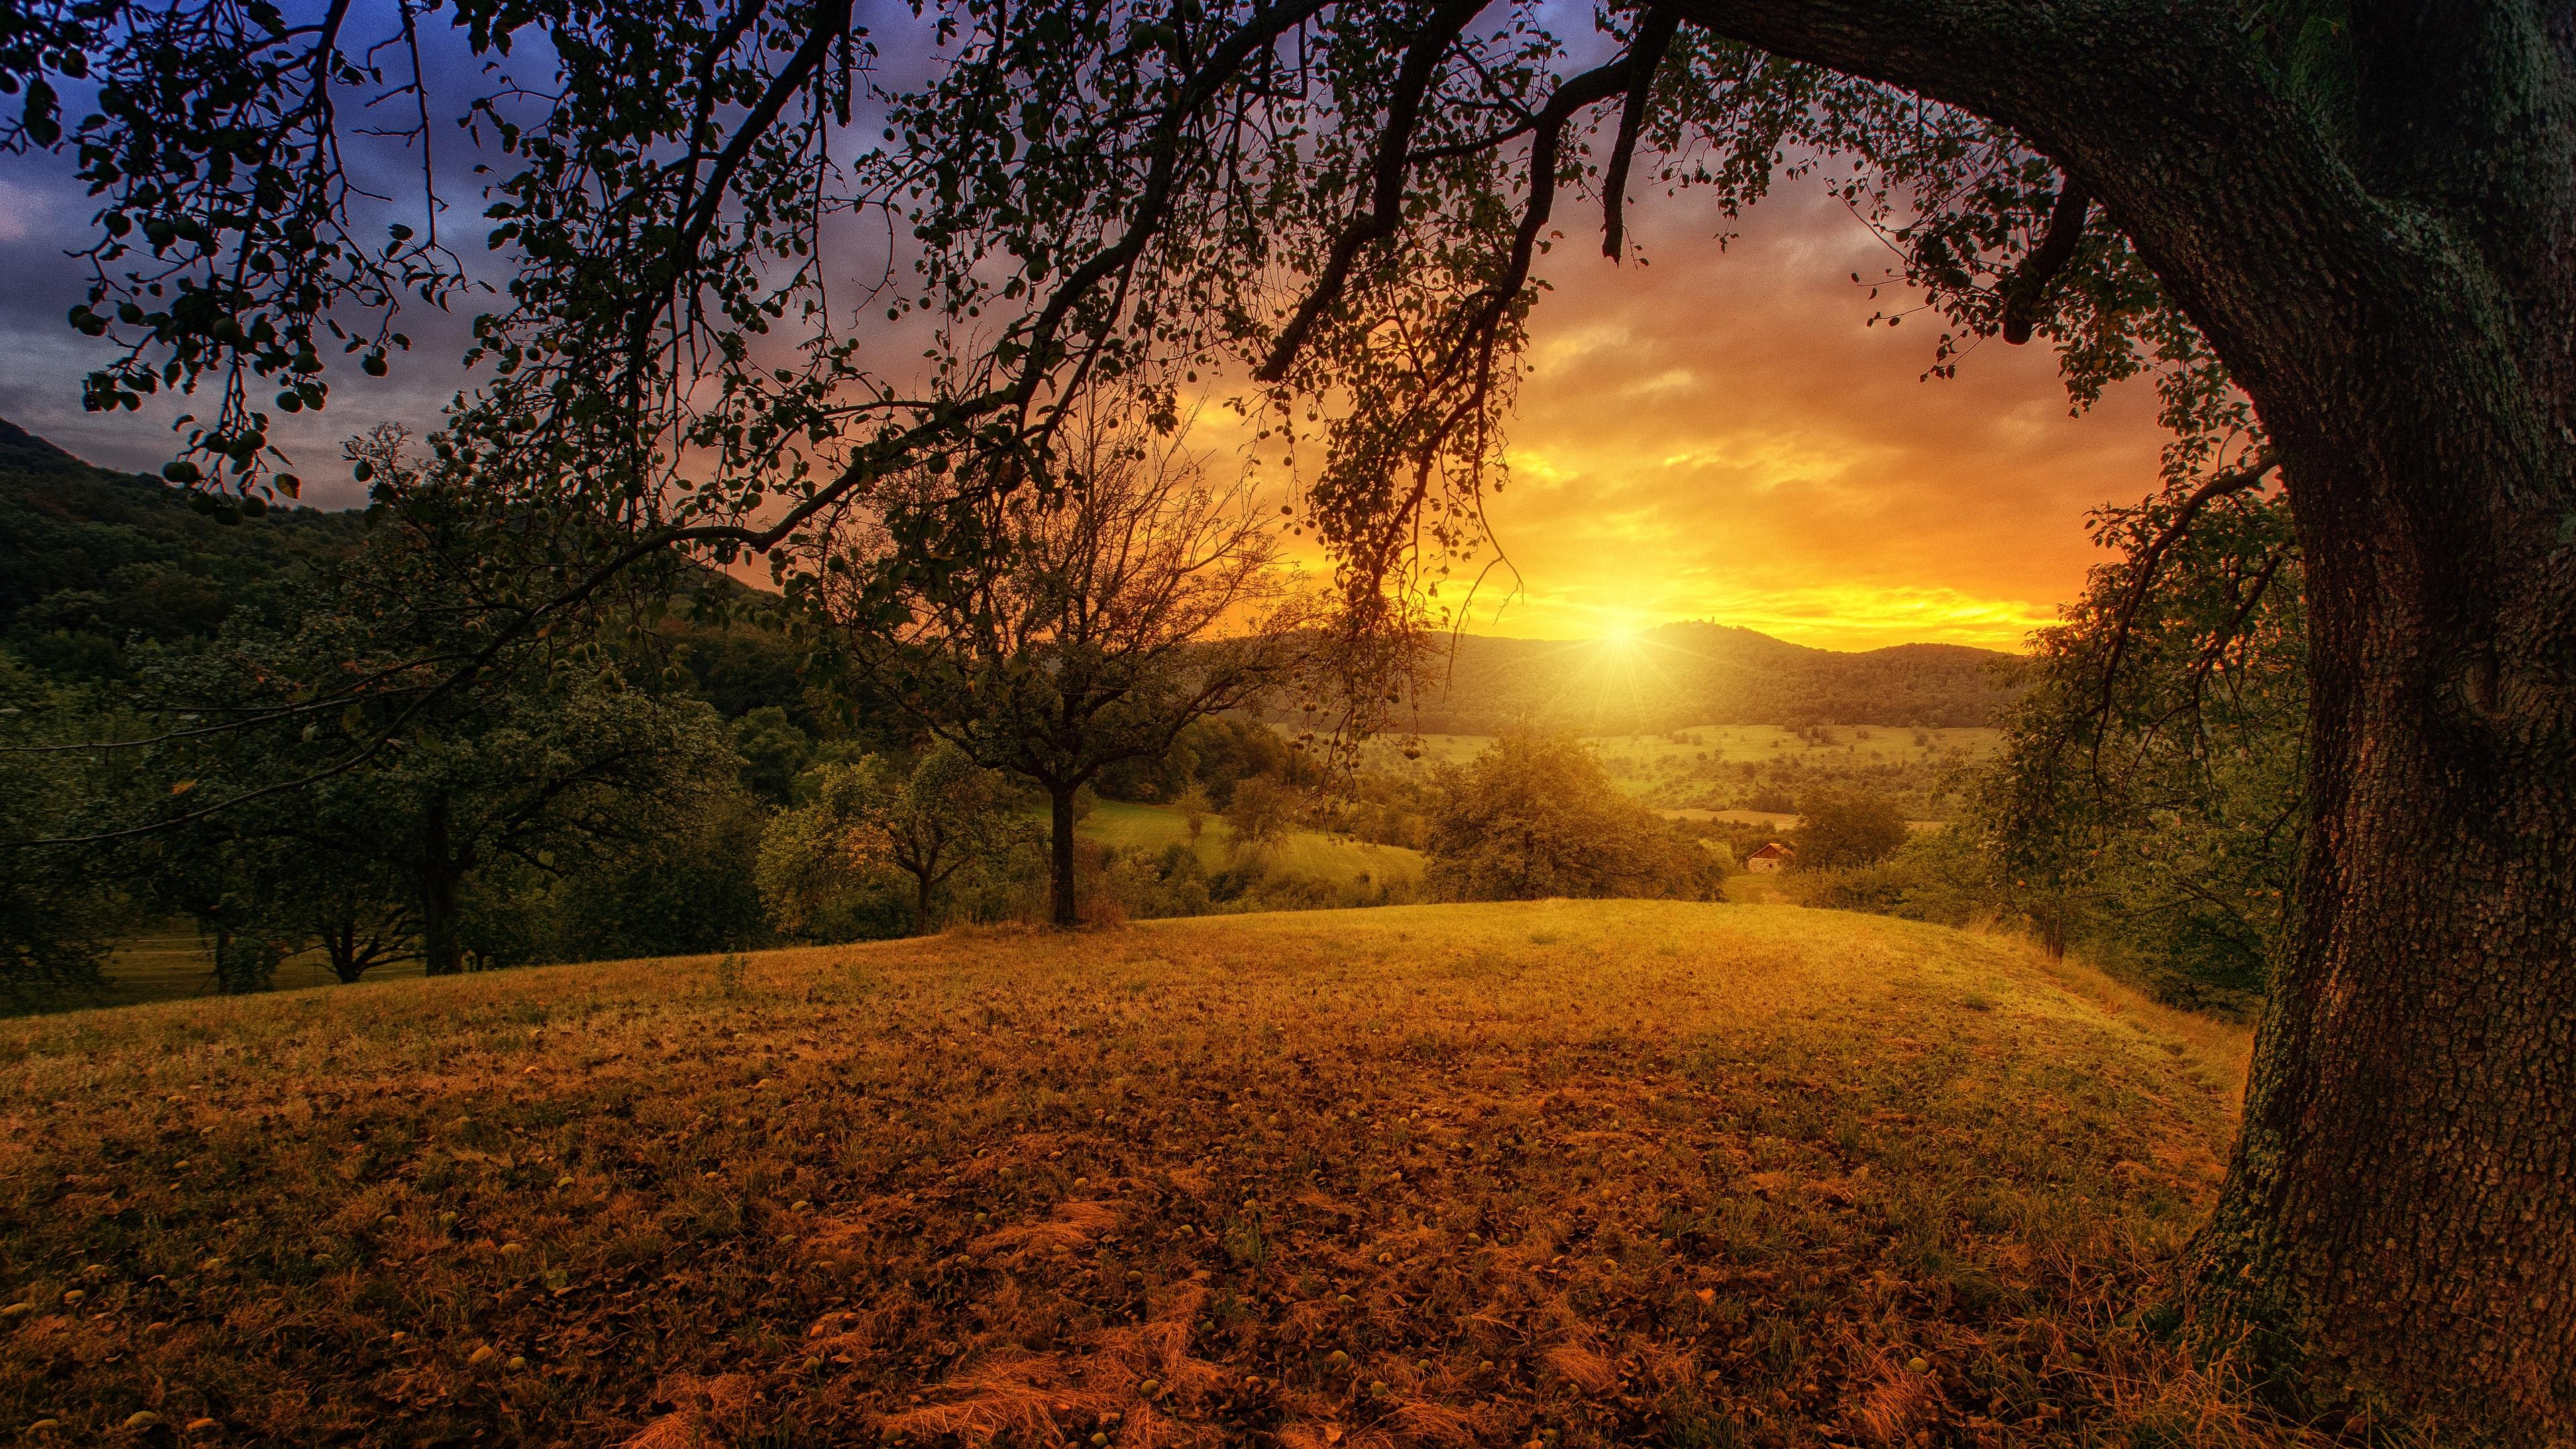 tree sun aesthetic dawn landscape panorama 4k 1540136337 - Tree Sun Aesthetic Dawn Landscape Panorama 4k - tree wallpapers, nature wallpapers, landscape wallpapers, hd-wallpapers, dusk wallpapers, dawn wallpapers, 5k wallpapers, 4k-wallpapers